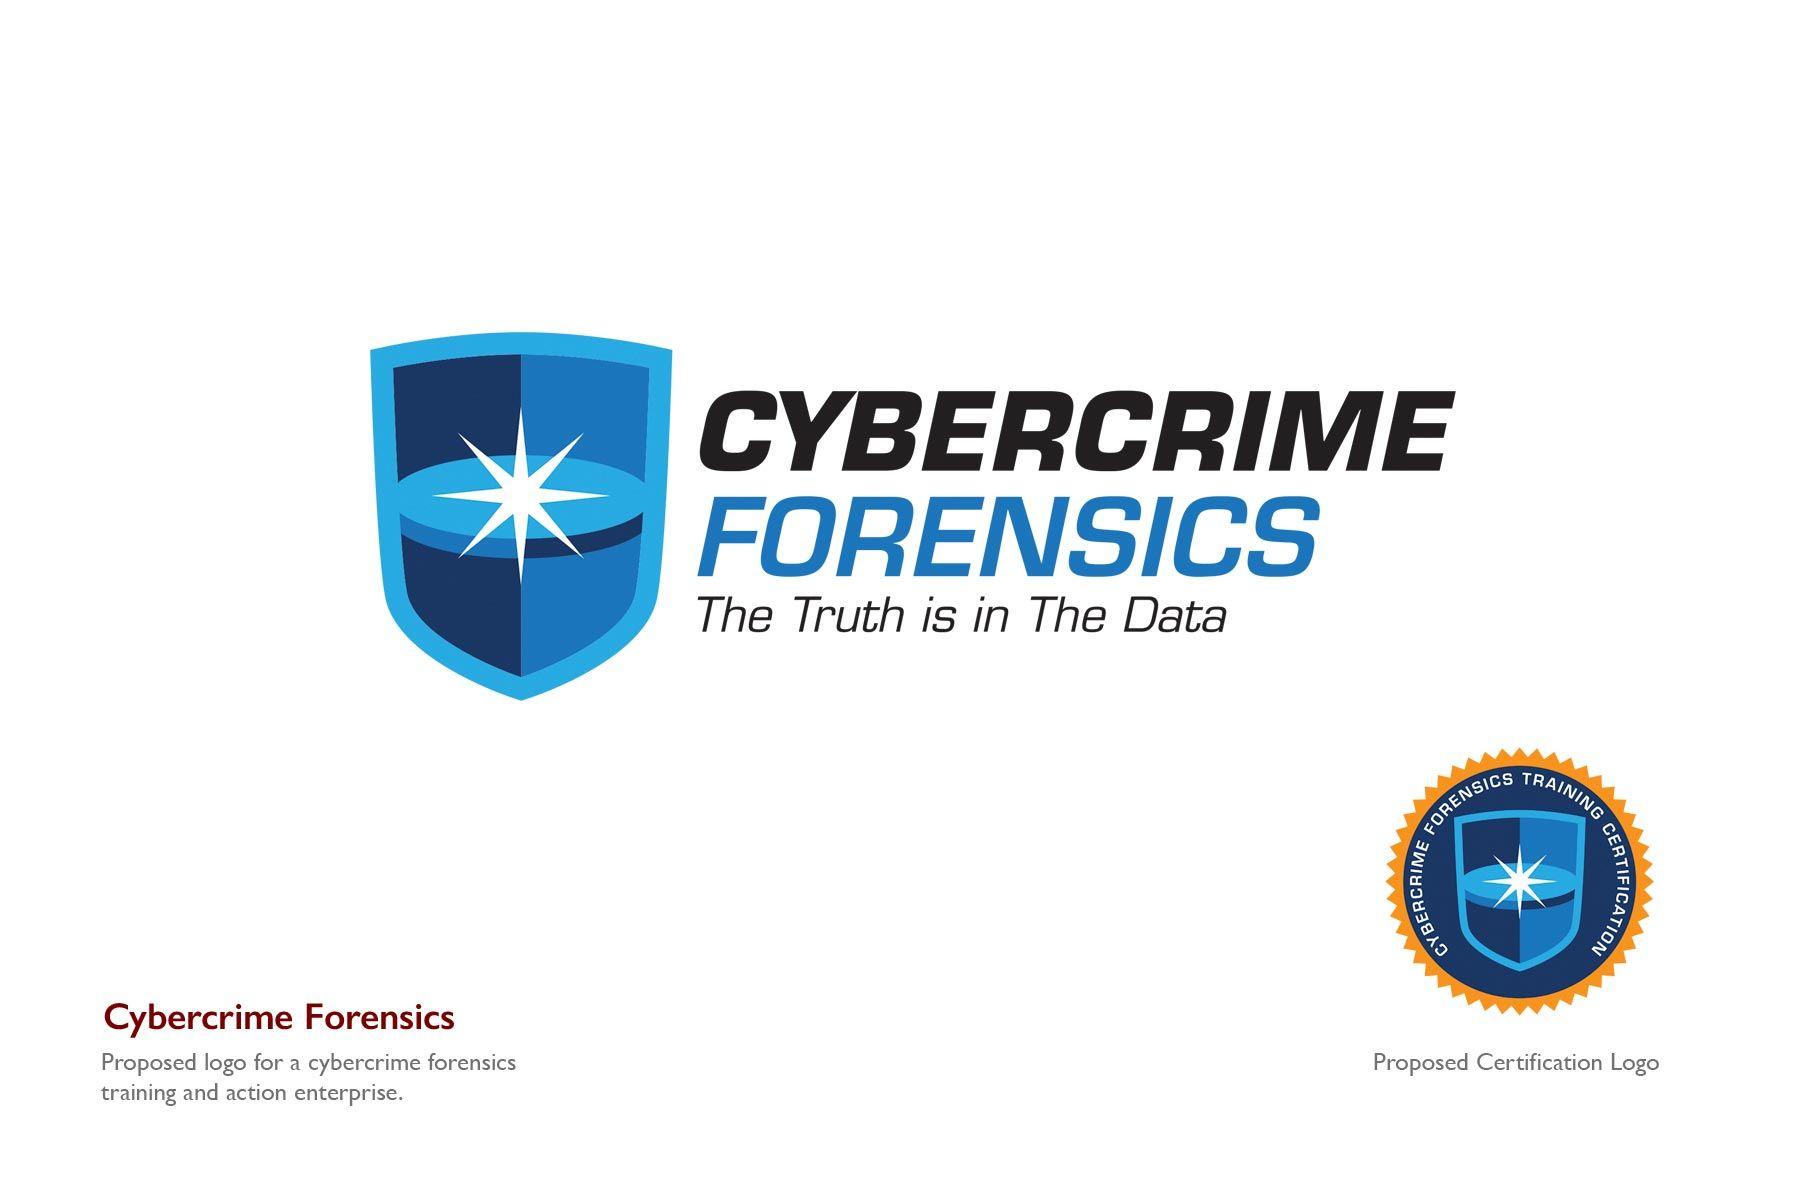 Cybercrime Forensics